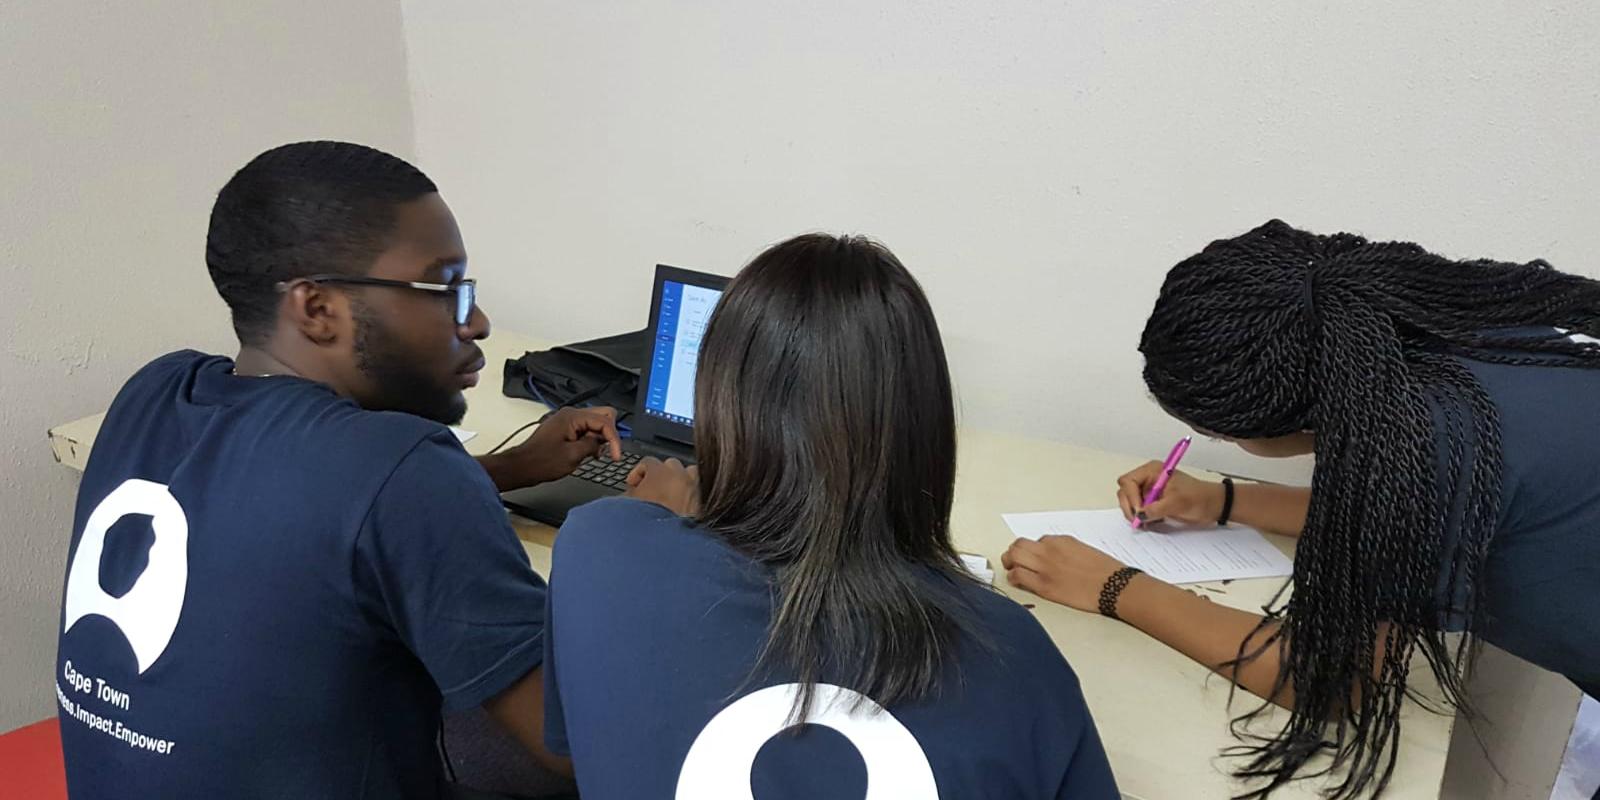 GVI participants plan lessons for the women's empowerment program on computer literacy.